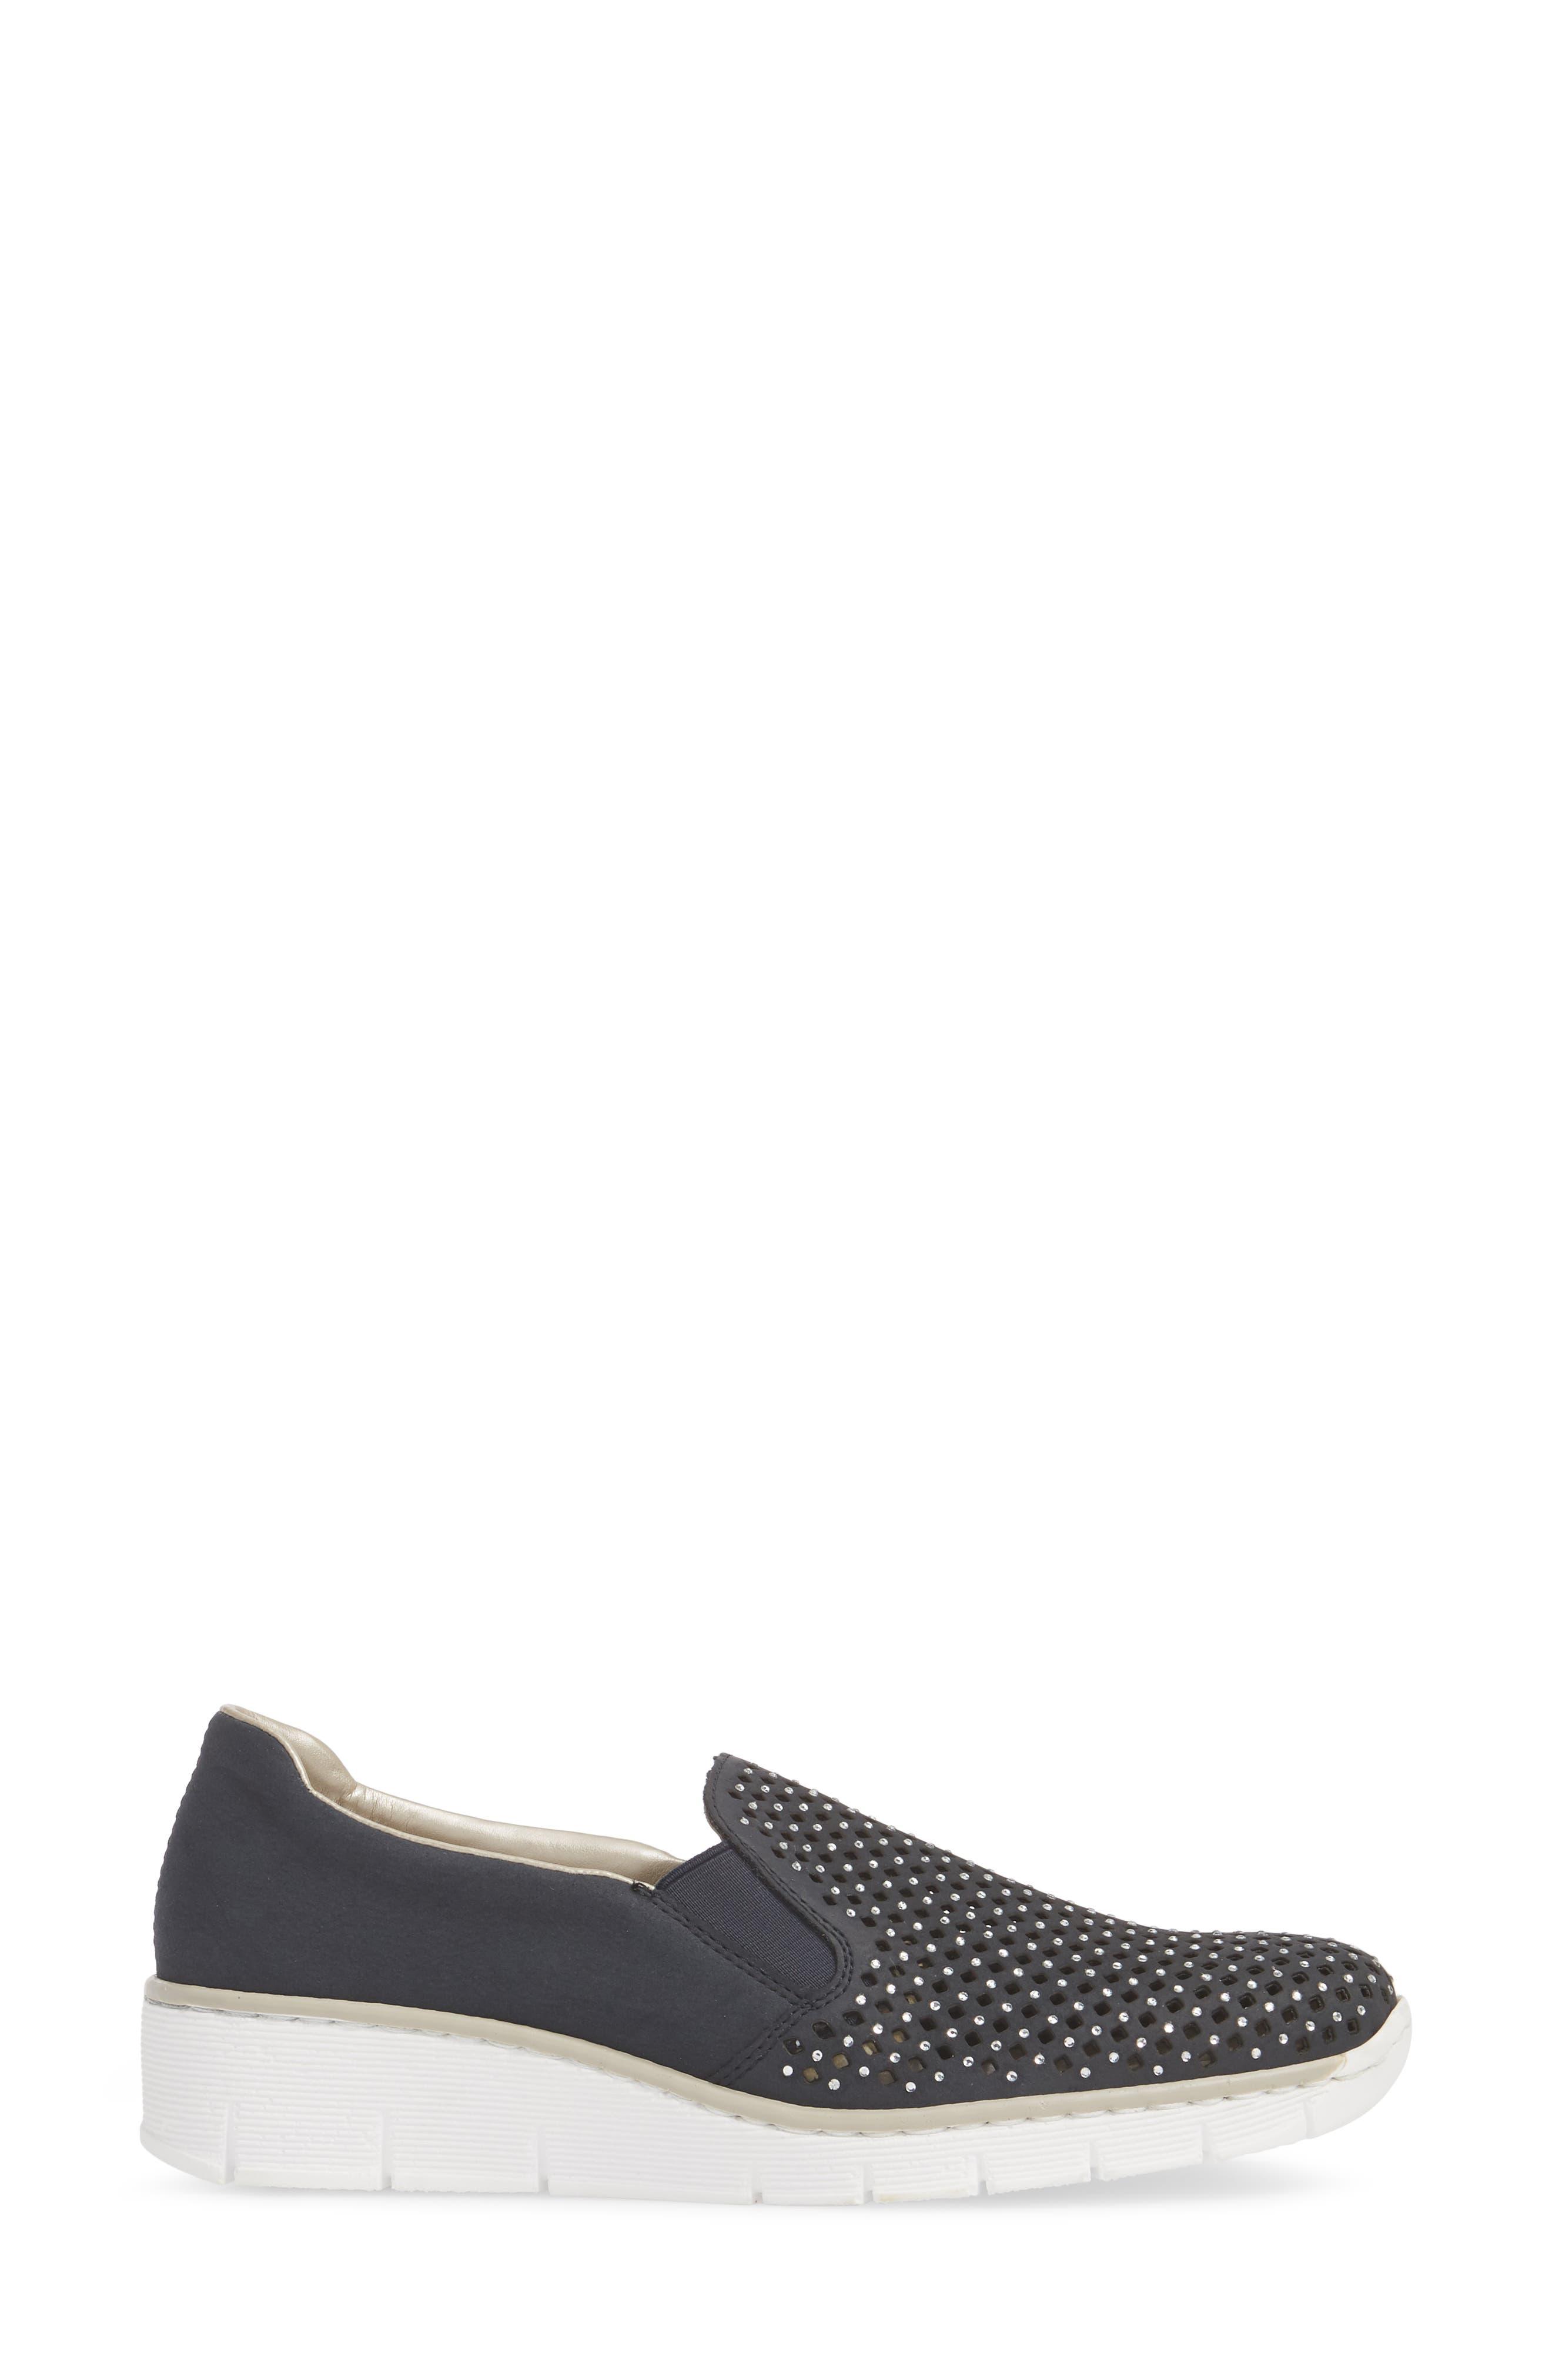 Doris A6 Wedge Sneaker,                             Alternate thumbnail 3, color,                             401